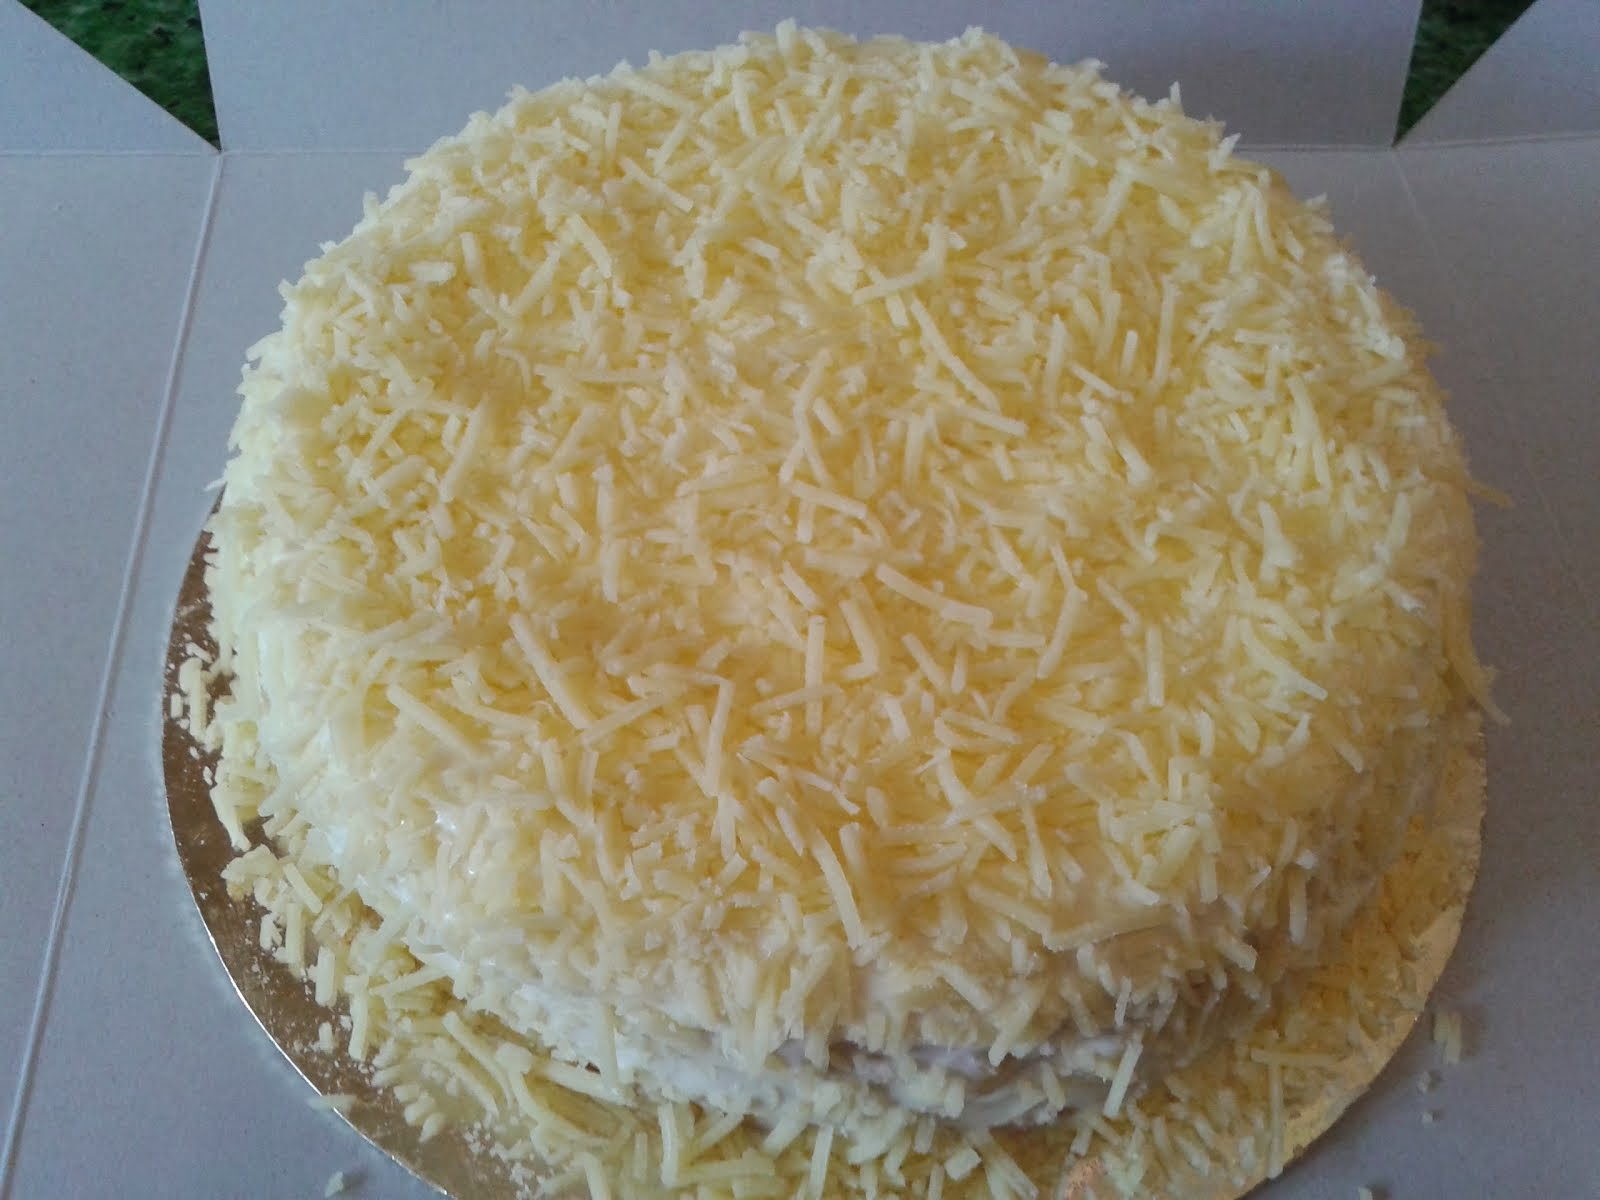 Snowy Cheese Cake